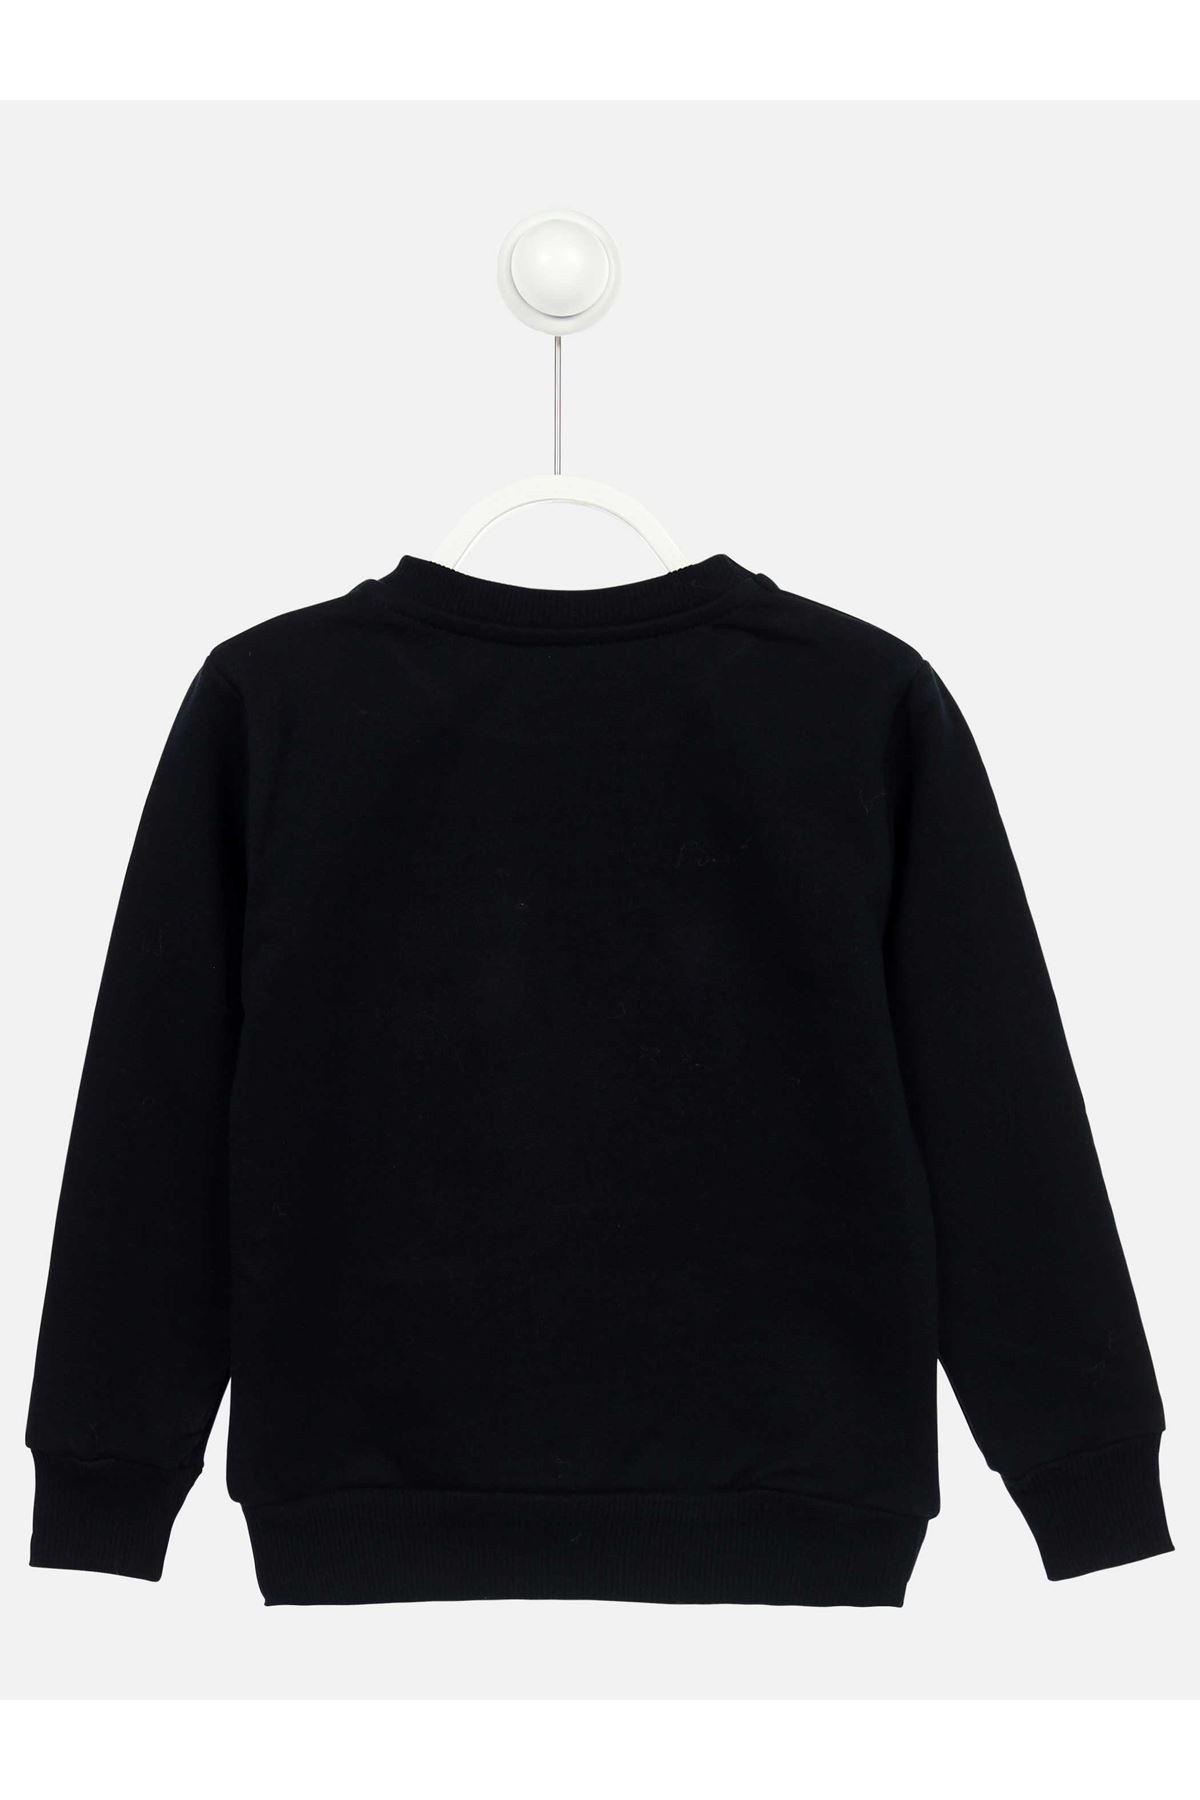 Navy Blue Seasonal Girl Child Sweatshirt